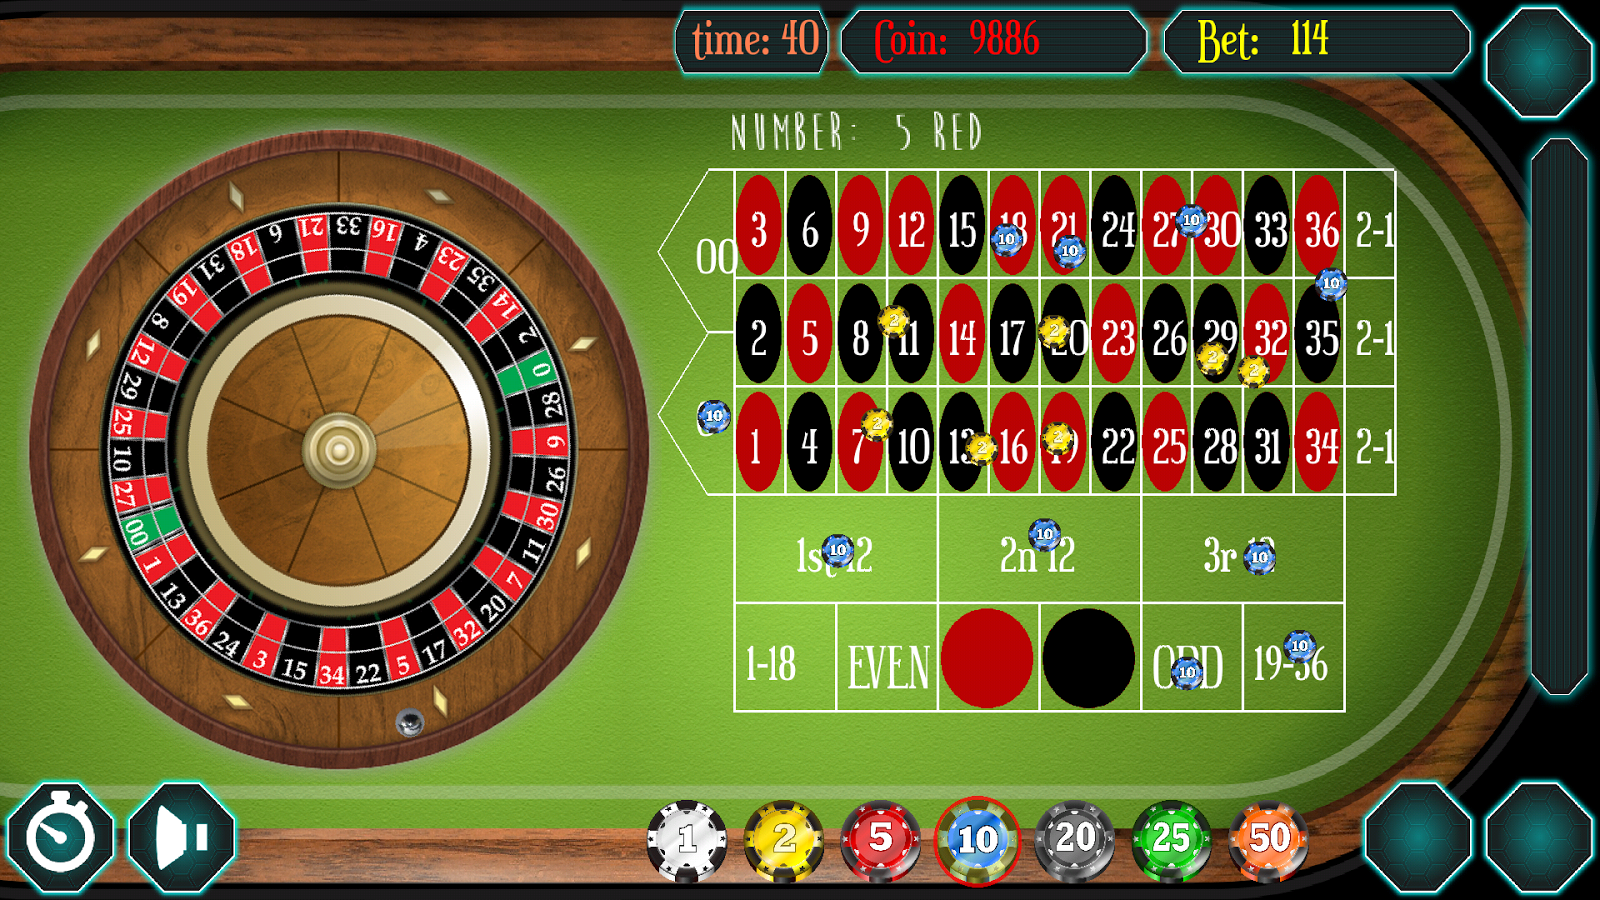 Lucky creek casino sign up